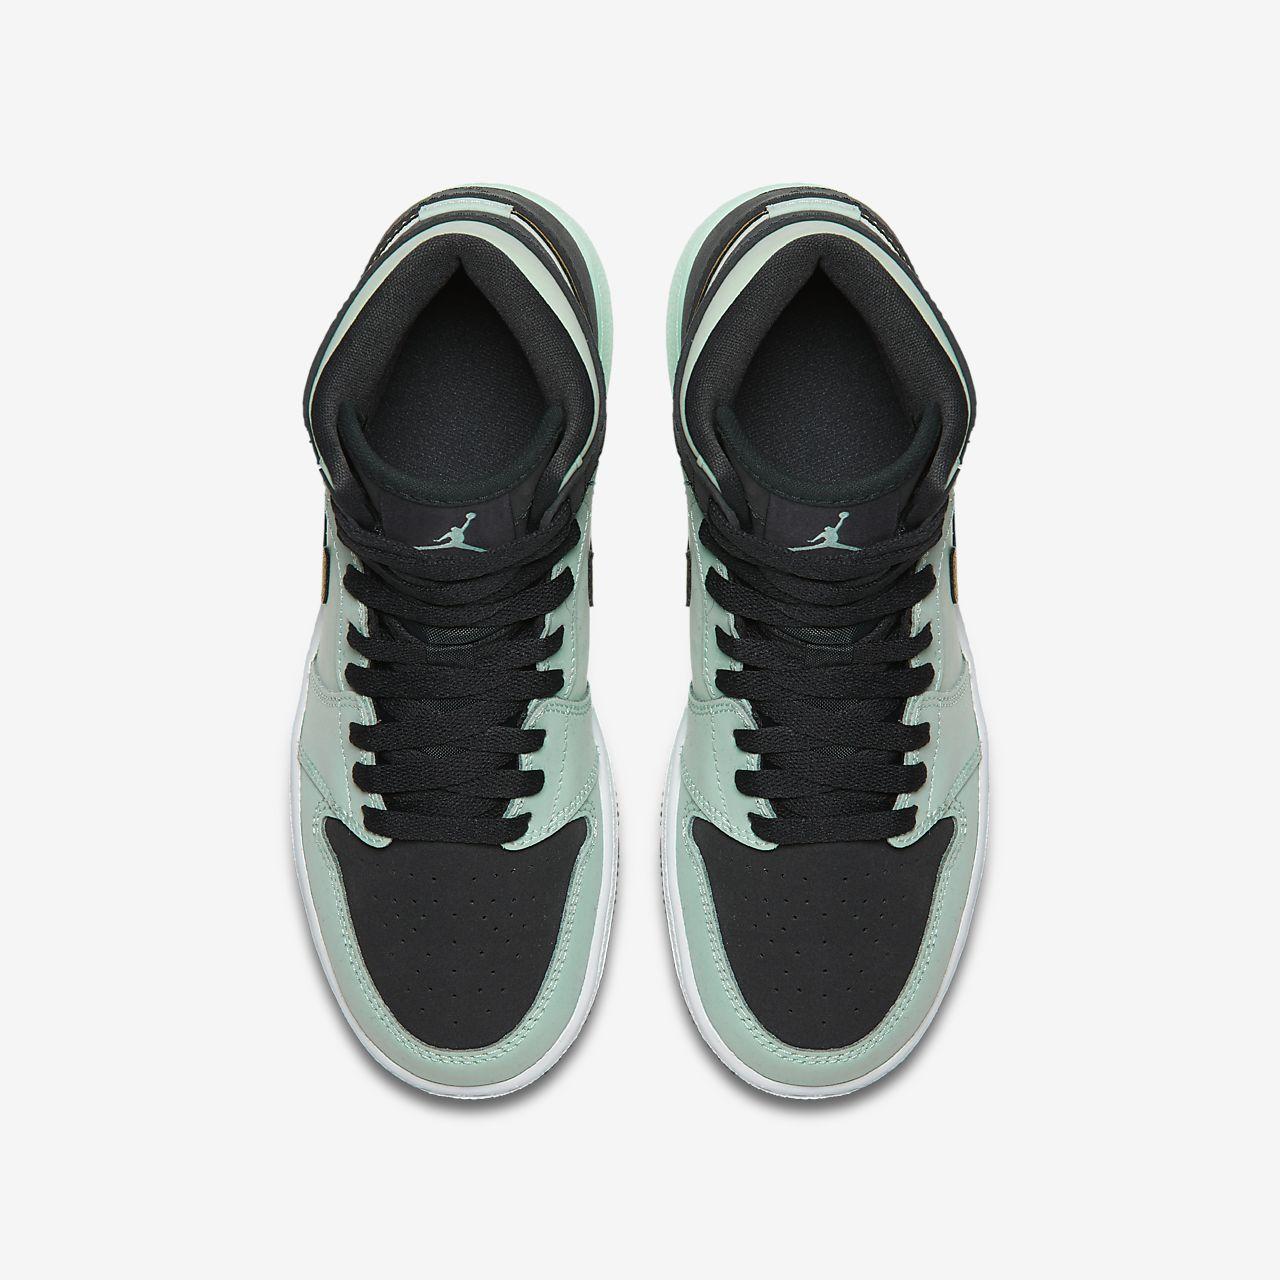 d42bd7594bca06 Jordan Retro 1 High Older Kids  Shoe. Nike.com IN